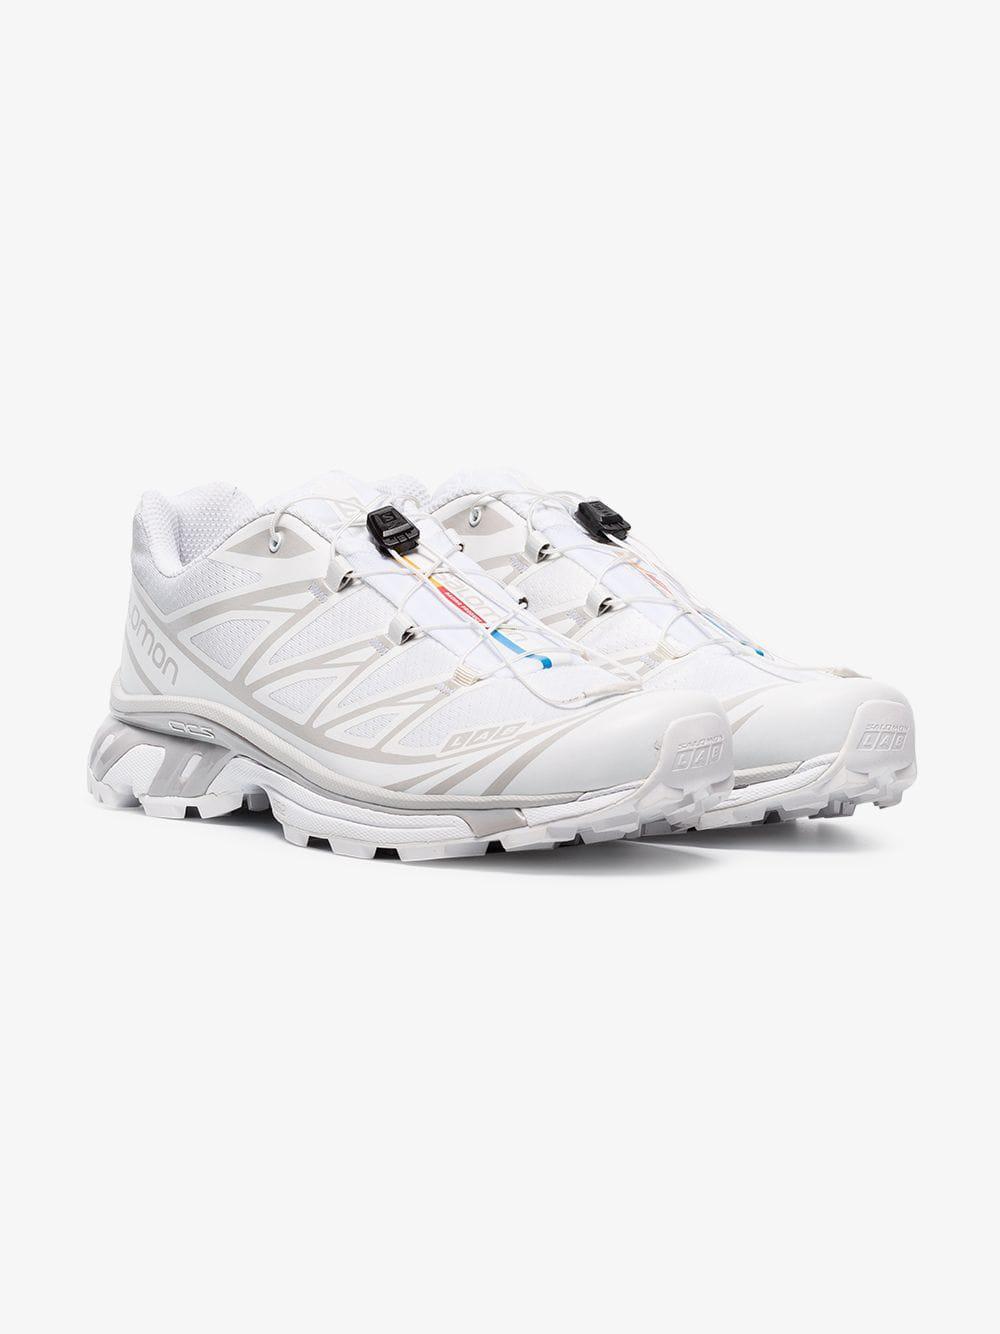 hot sale online 87207 0c8bd Salomon S LAB Xt-6 Adv Sneakers in White for Men - Lyst